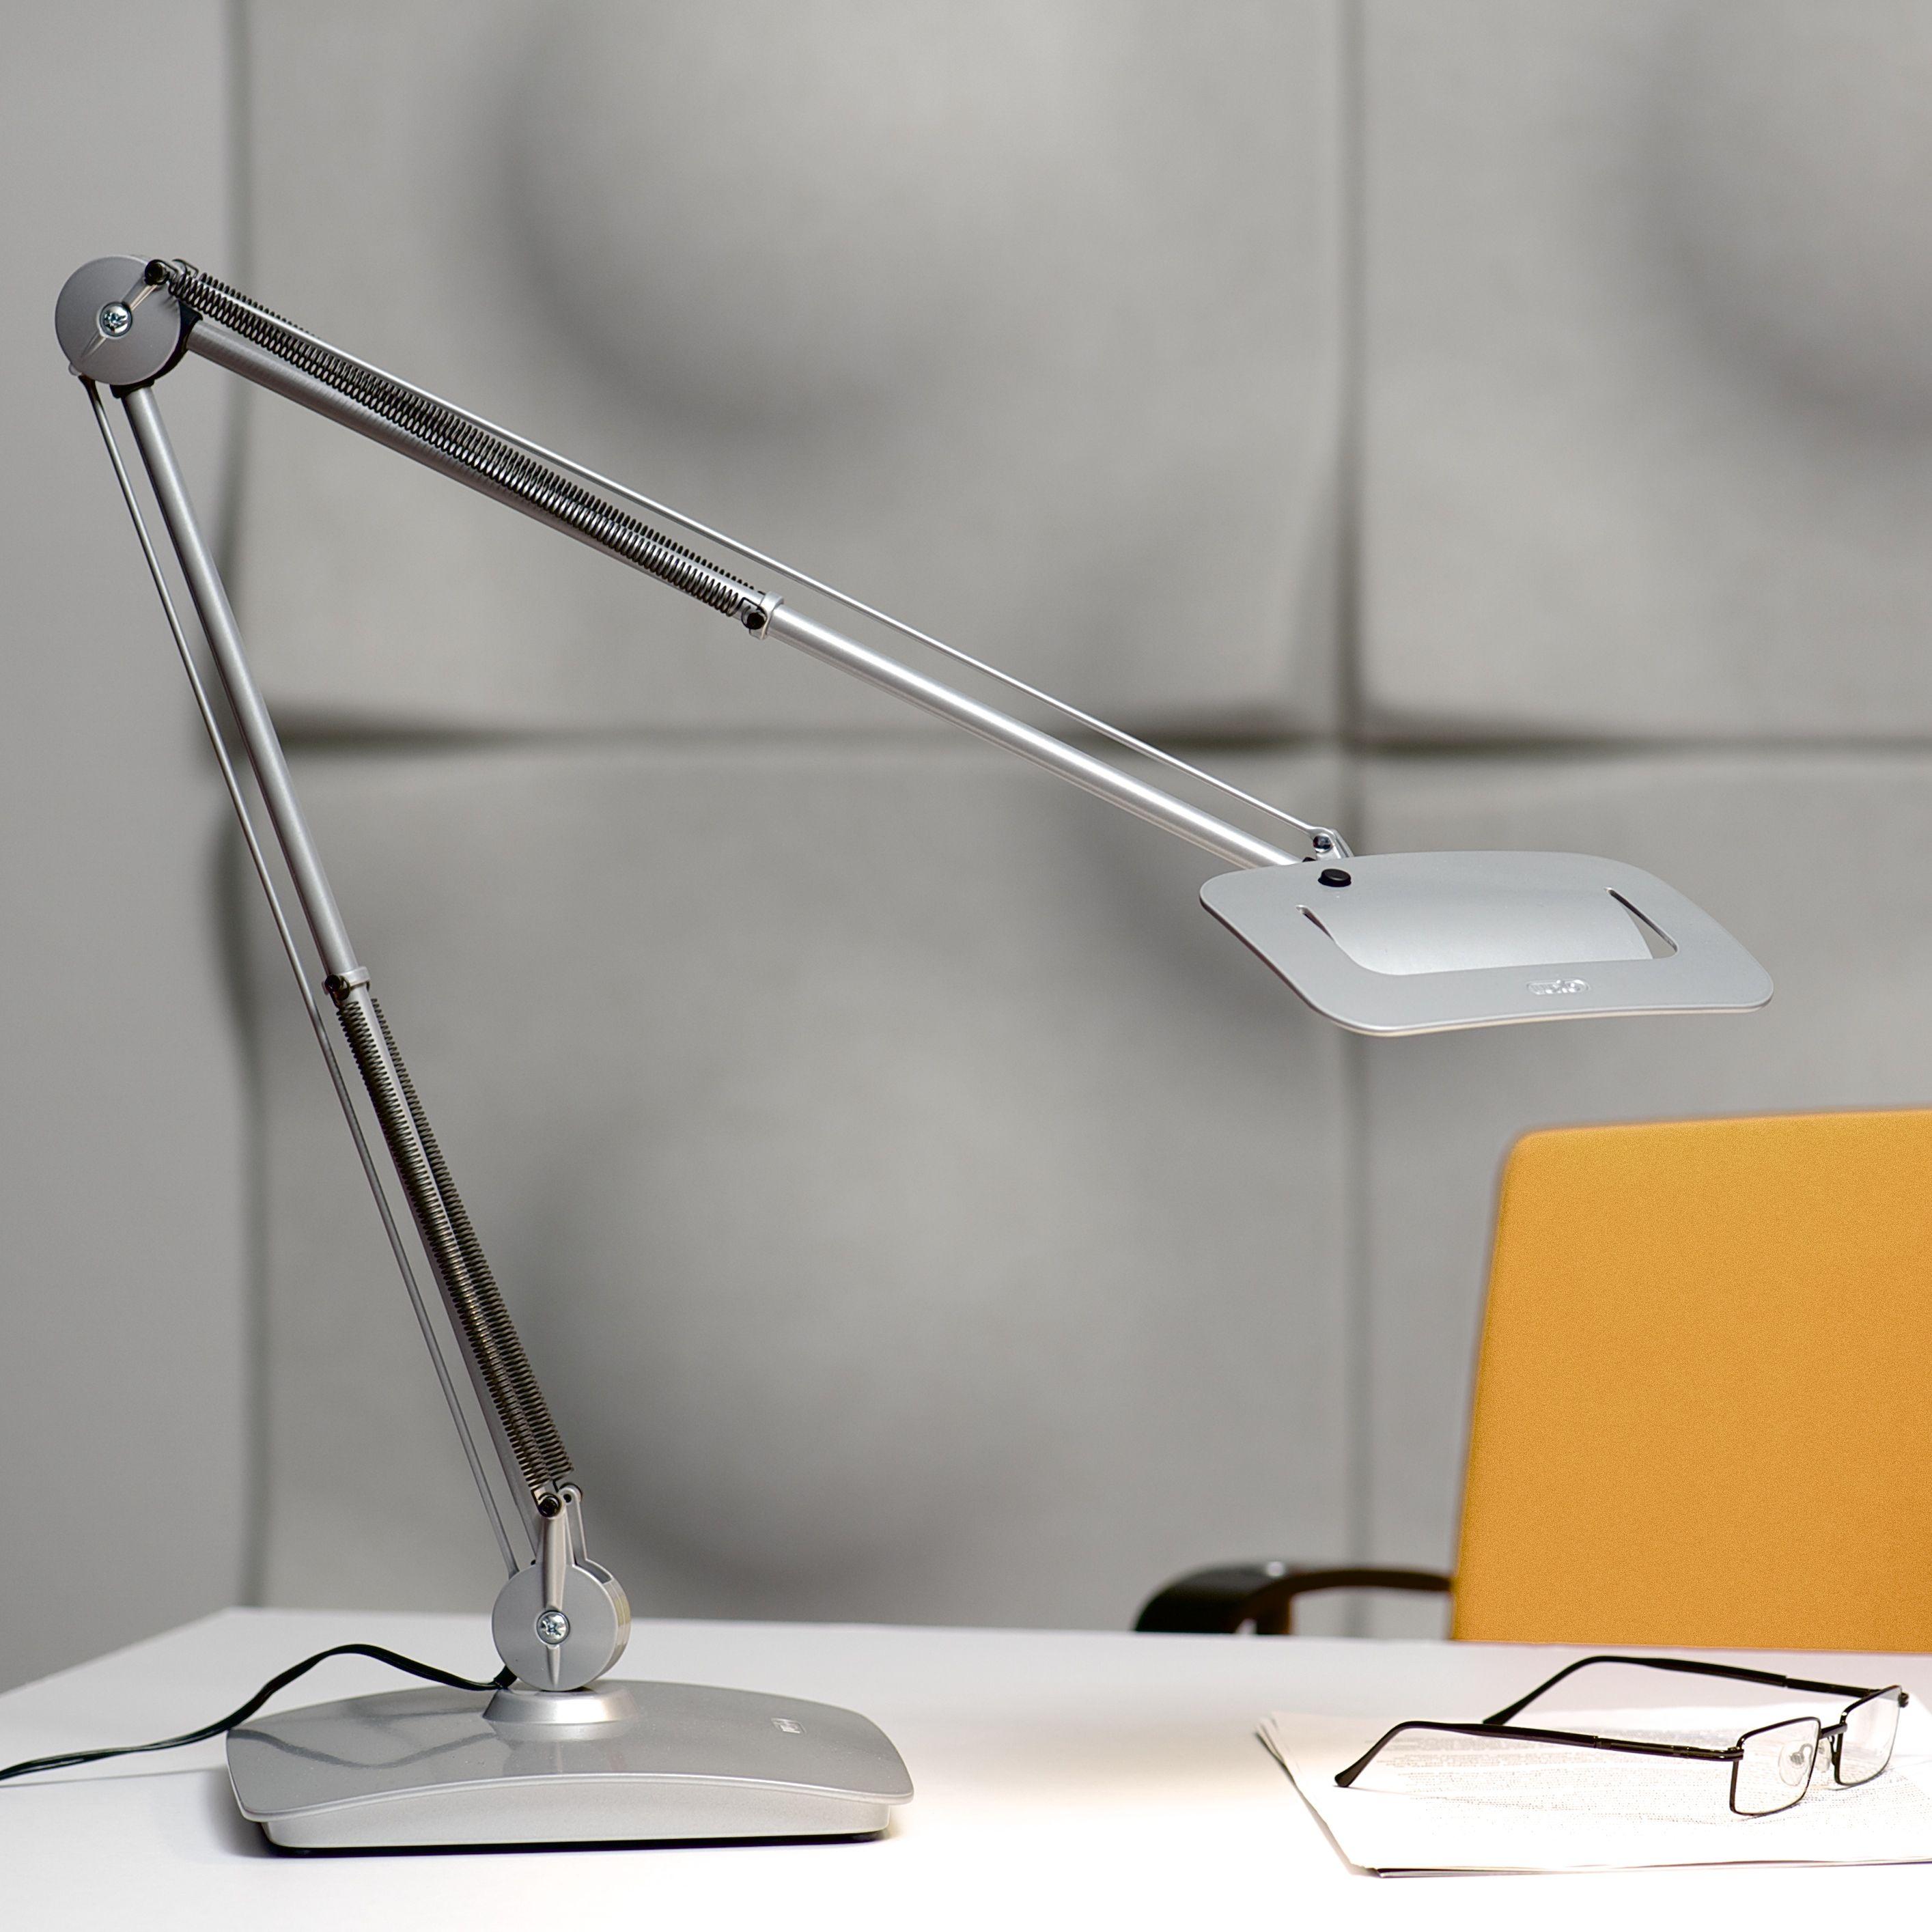 luxo lighting split has the most light output of any led task  - luxo lighting split has the most light output of any led task lighting